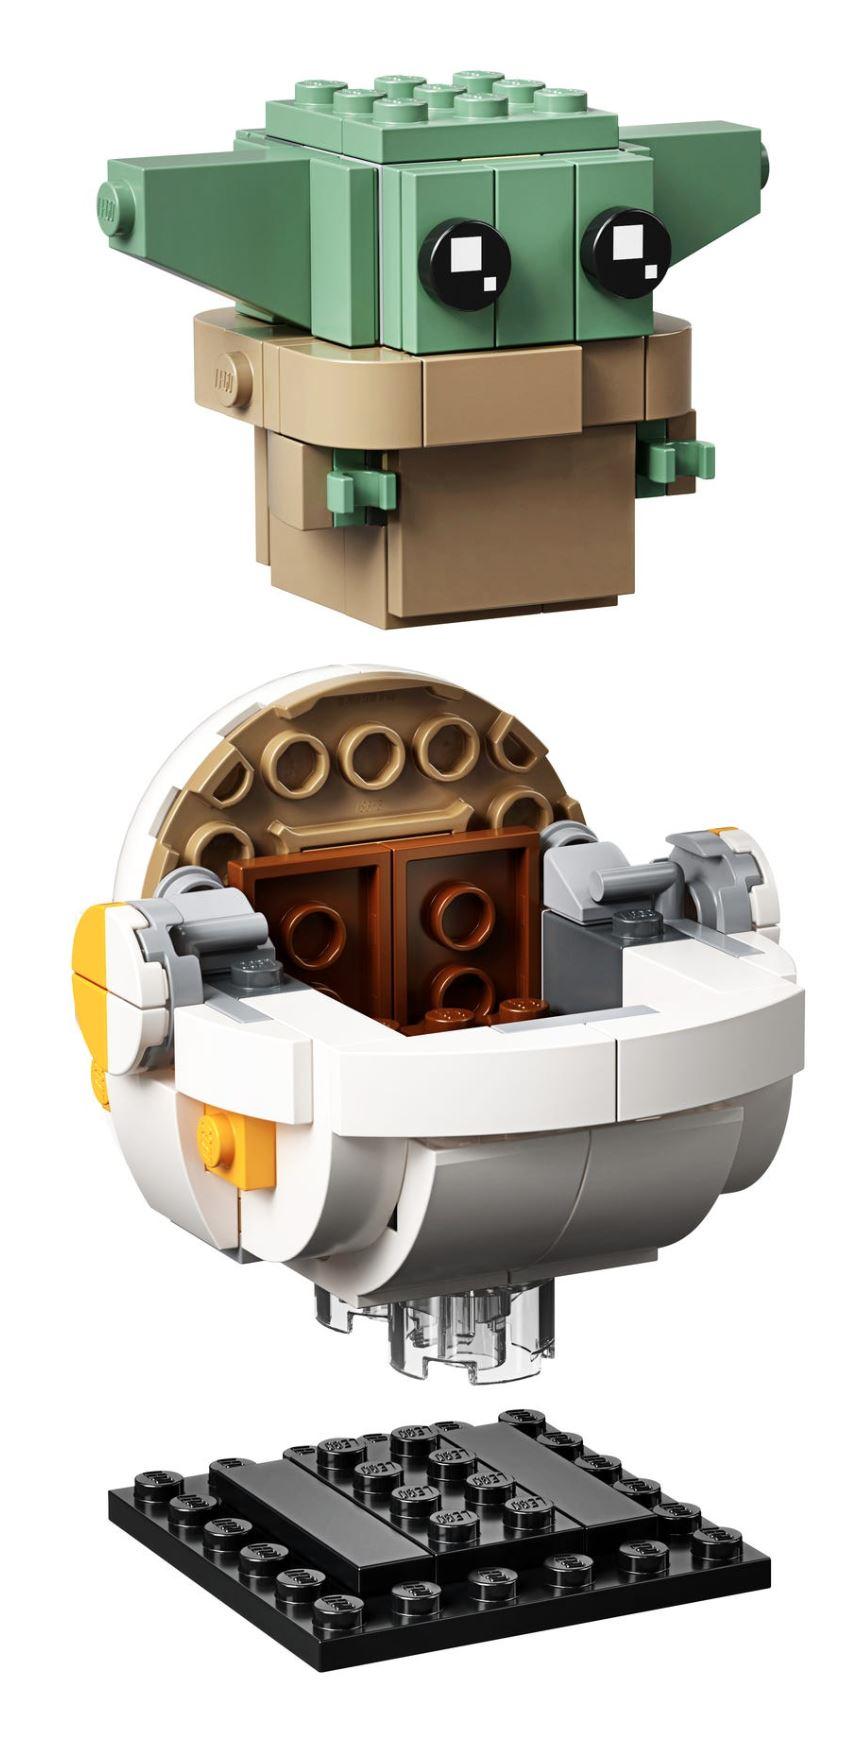 LEGO StarWars 75317 BrickHeadz The Mandalorian & The Child 75317_18